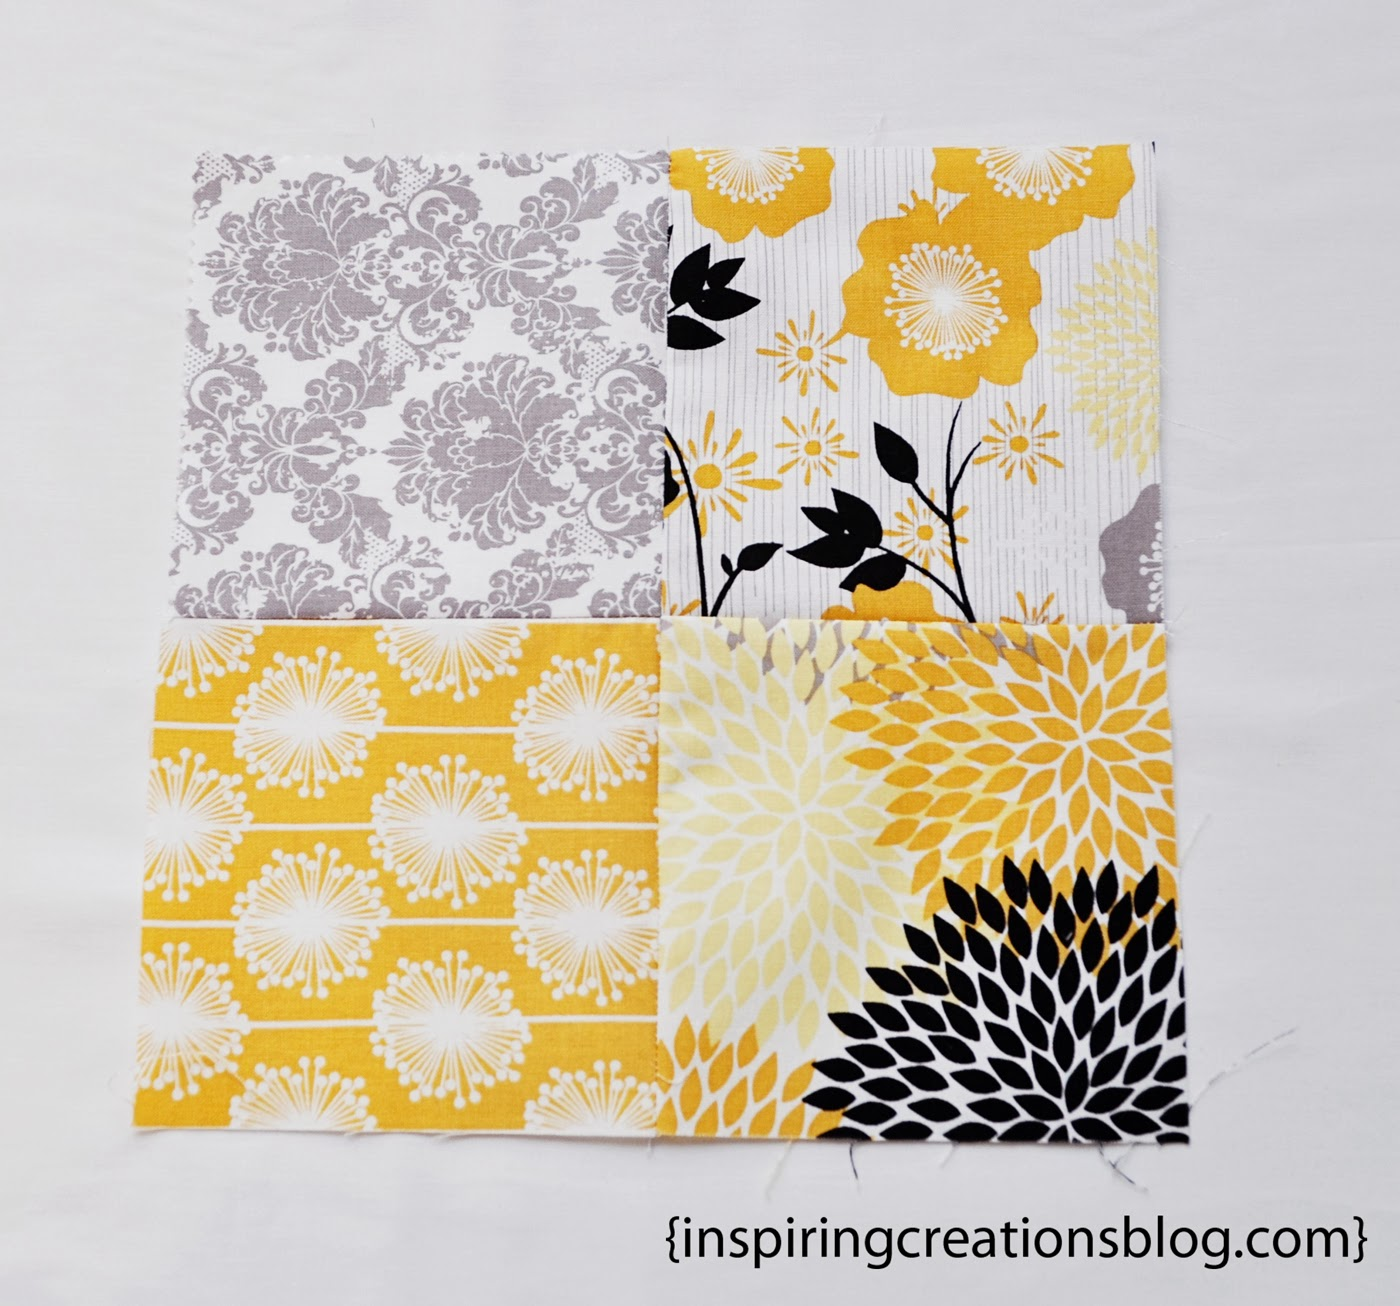 Inspiring Creations: 4-Patch Slice-Free Quilt Block Tutorial